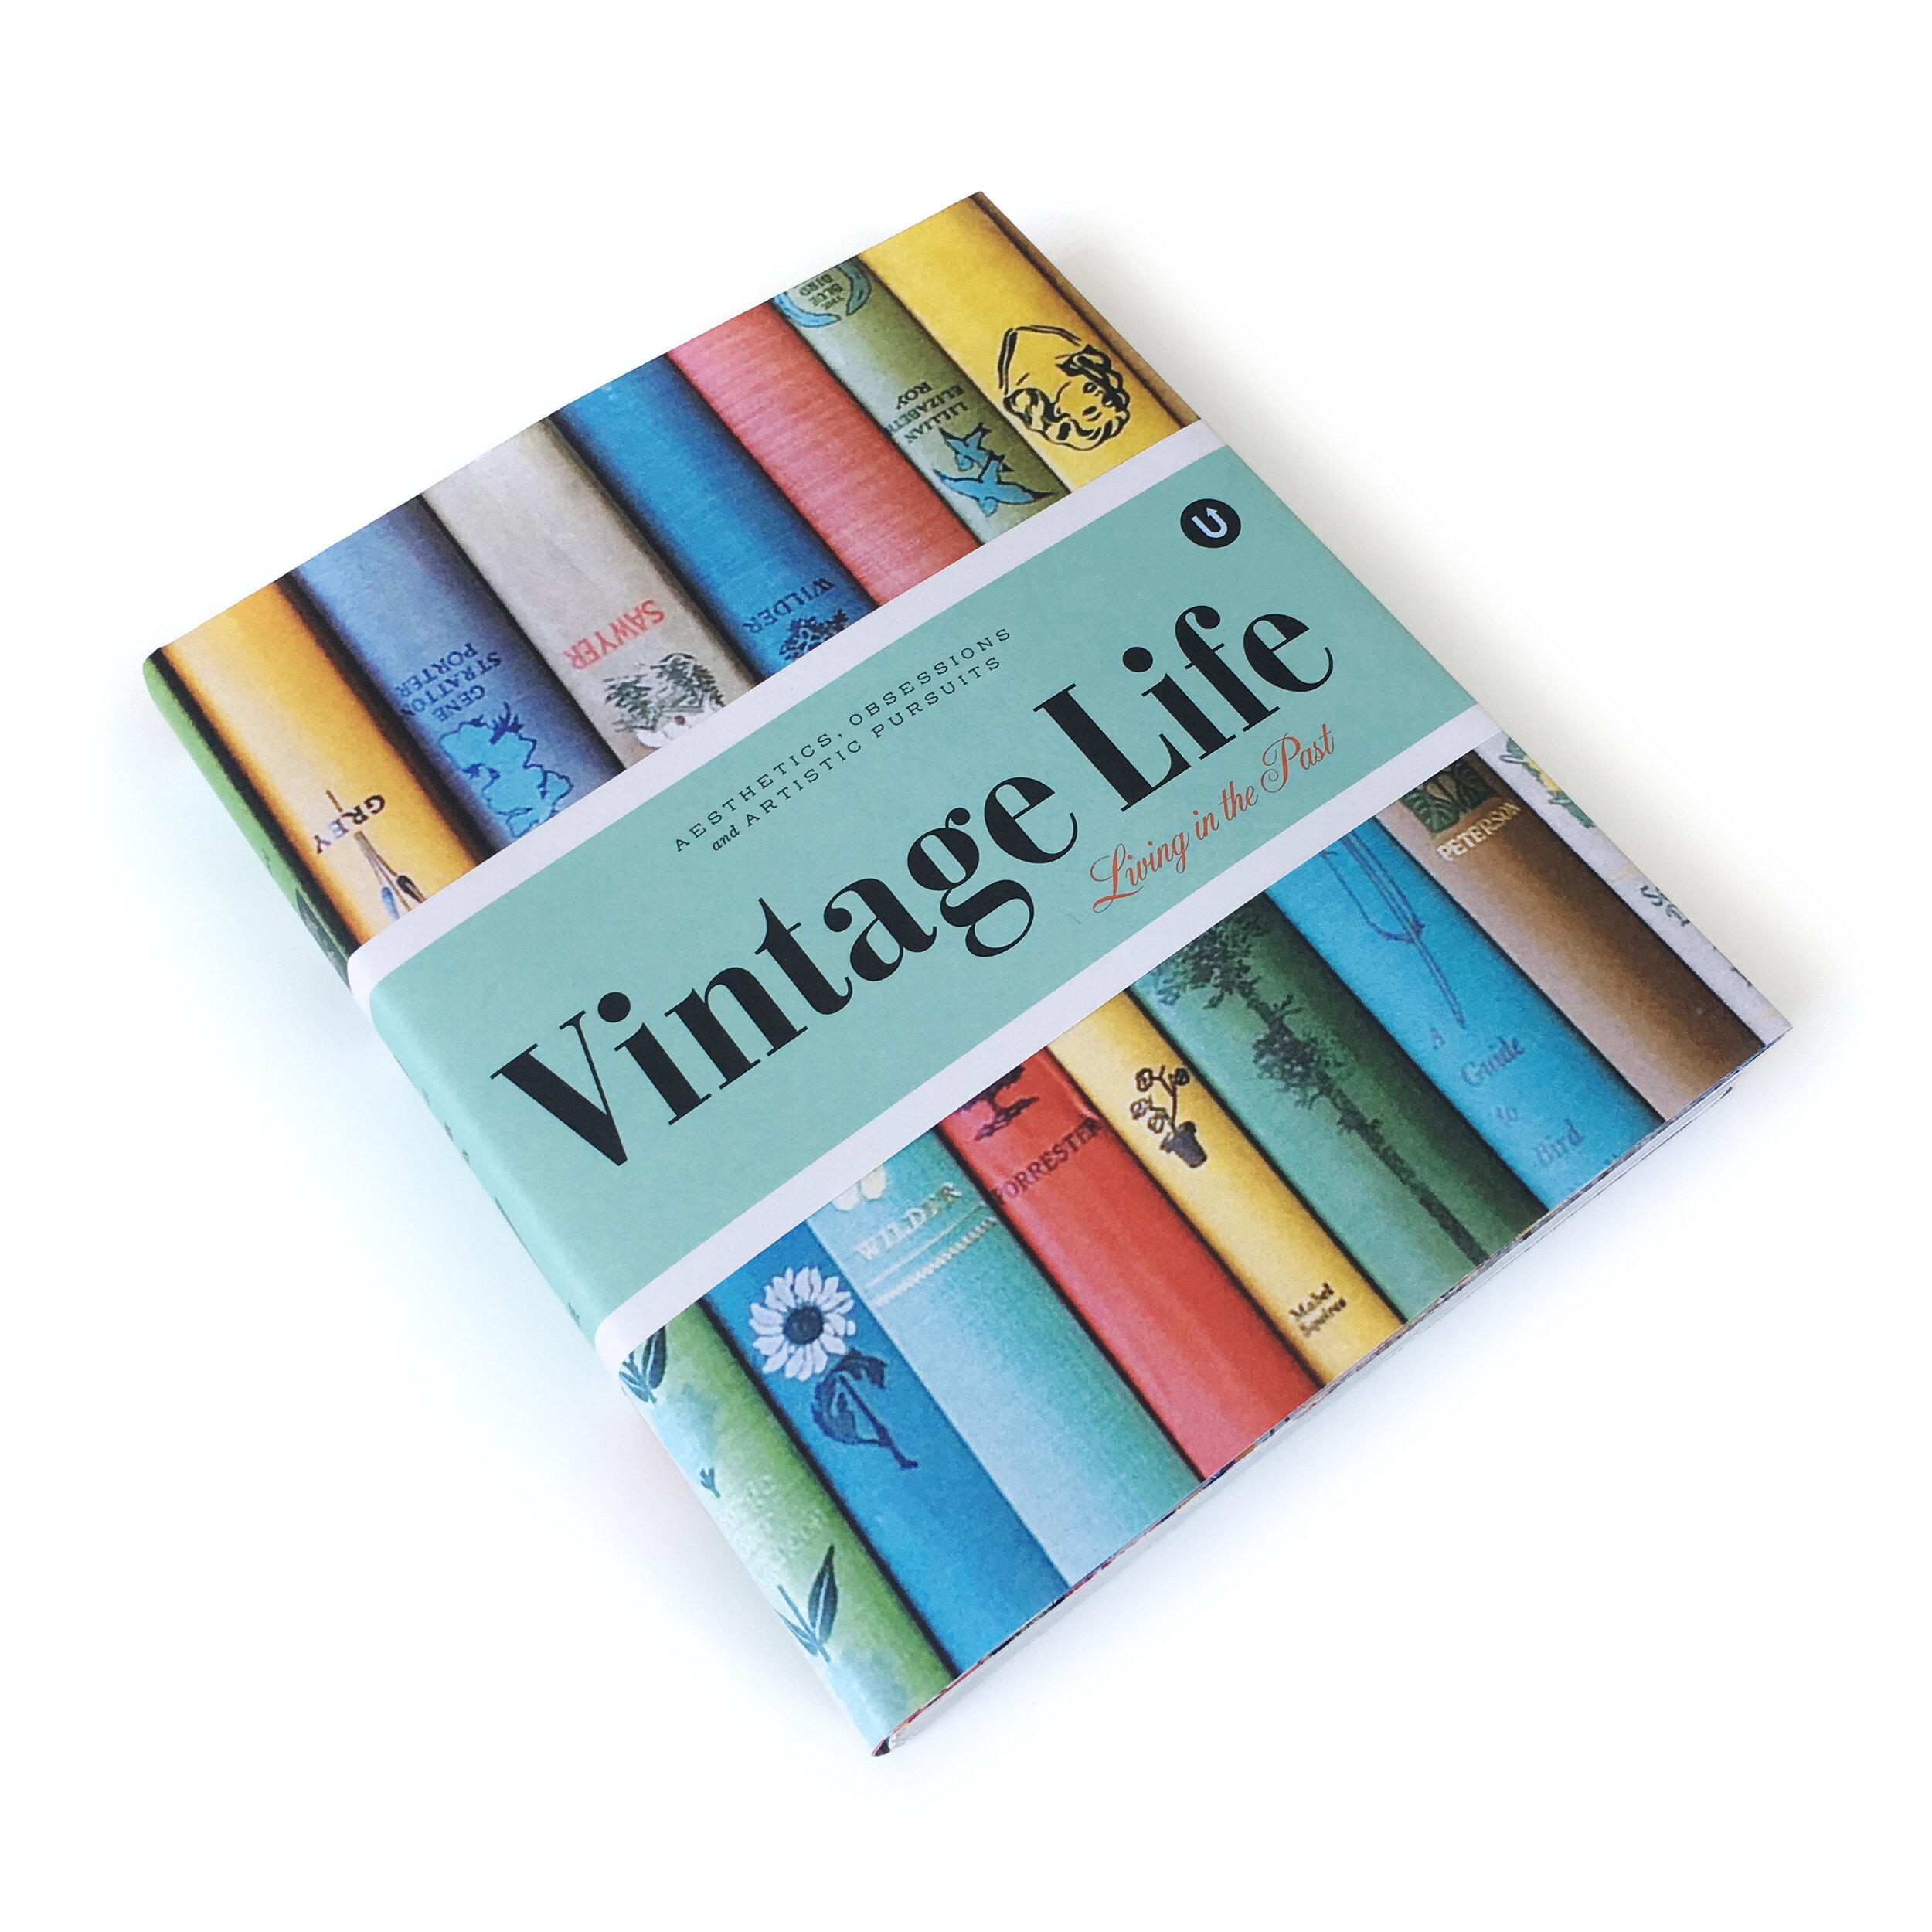 VintageLife-dustjackets-4.JPG